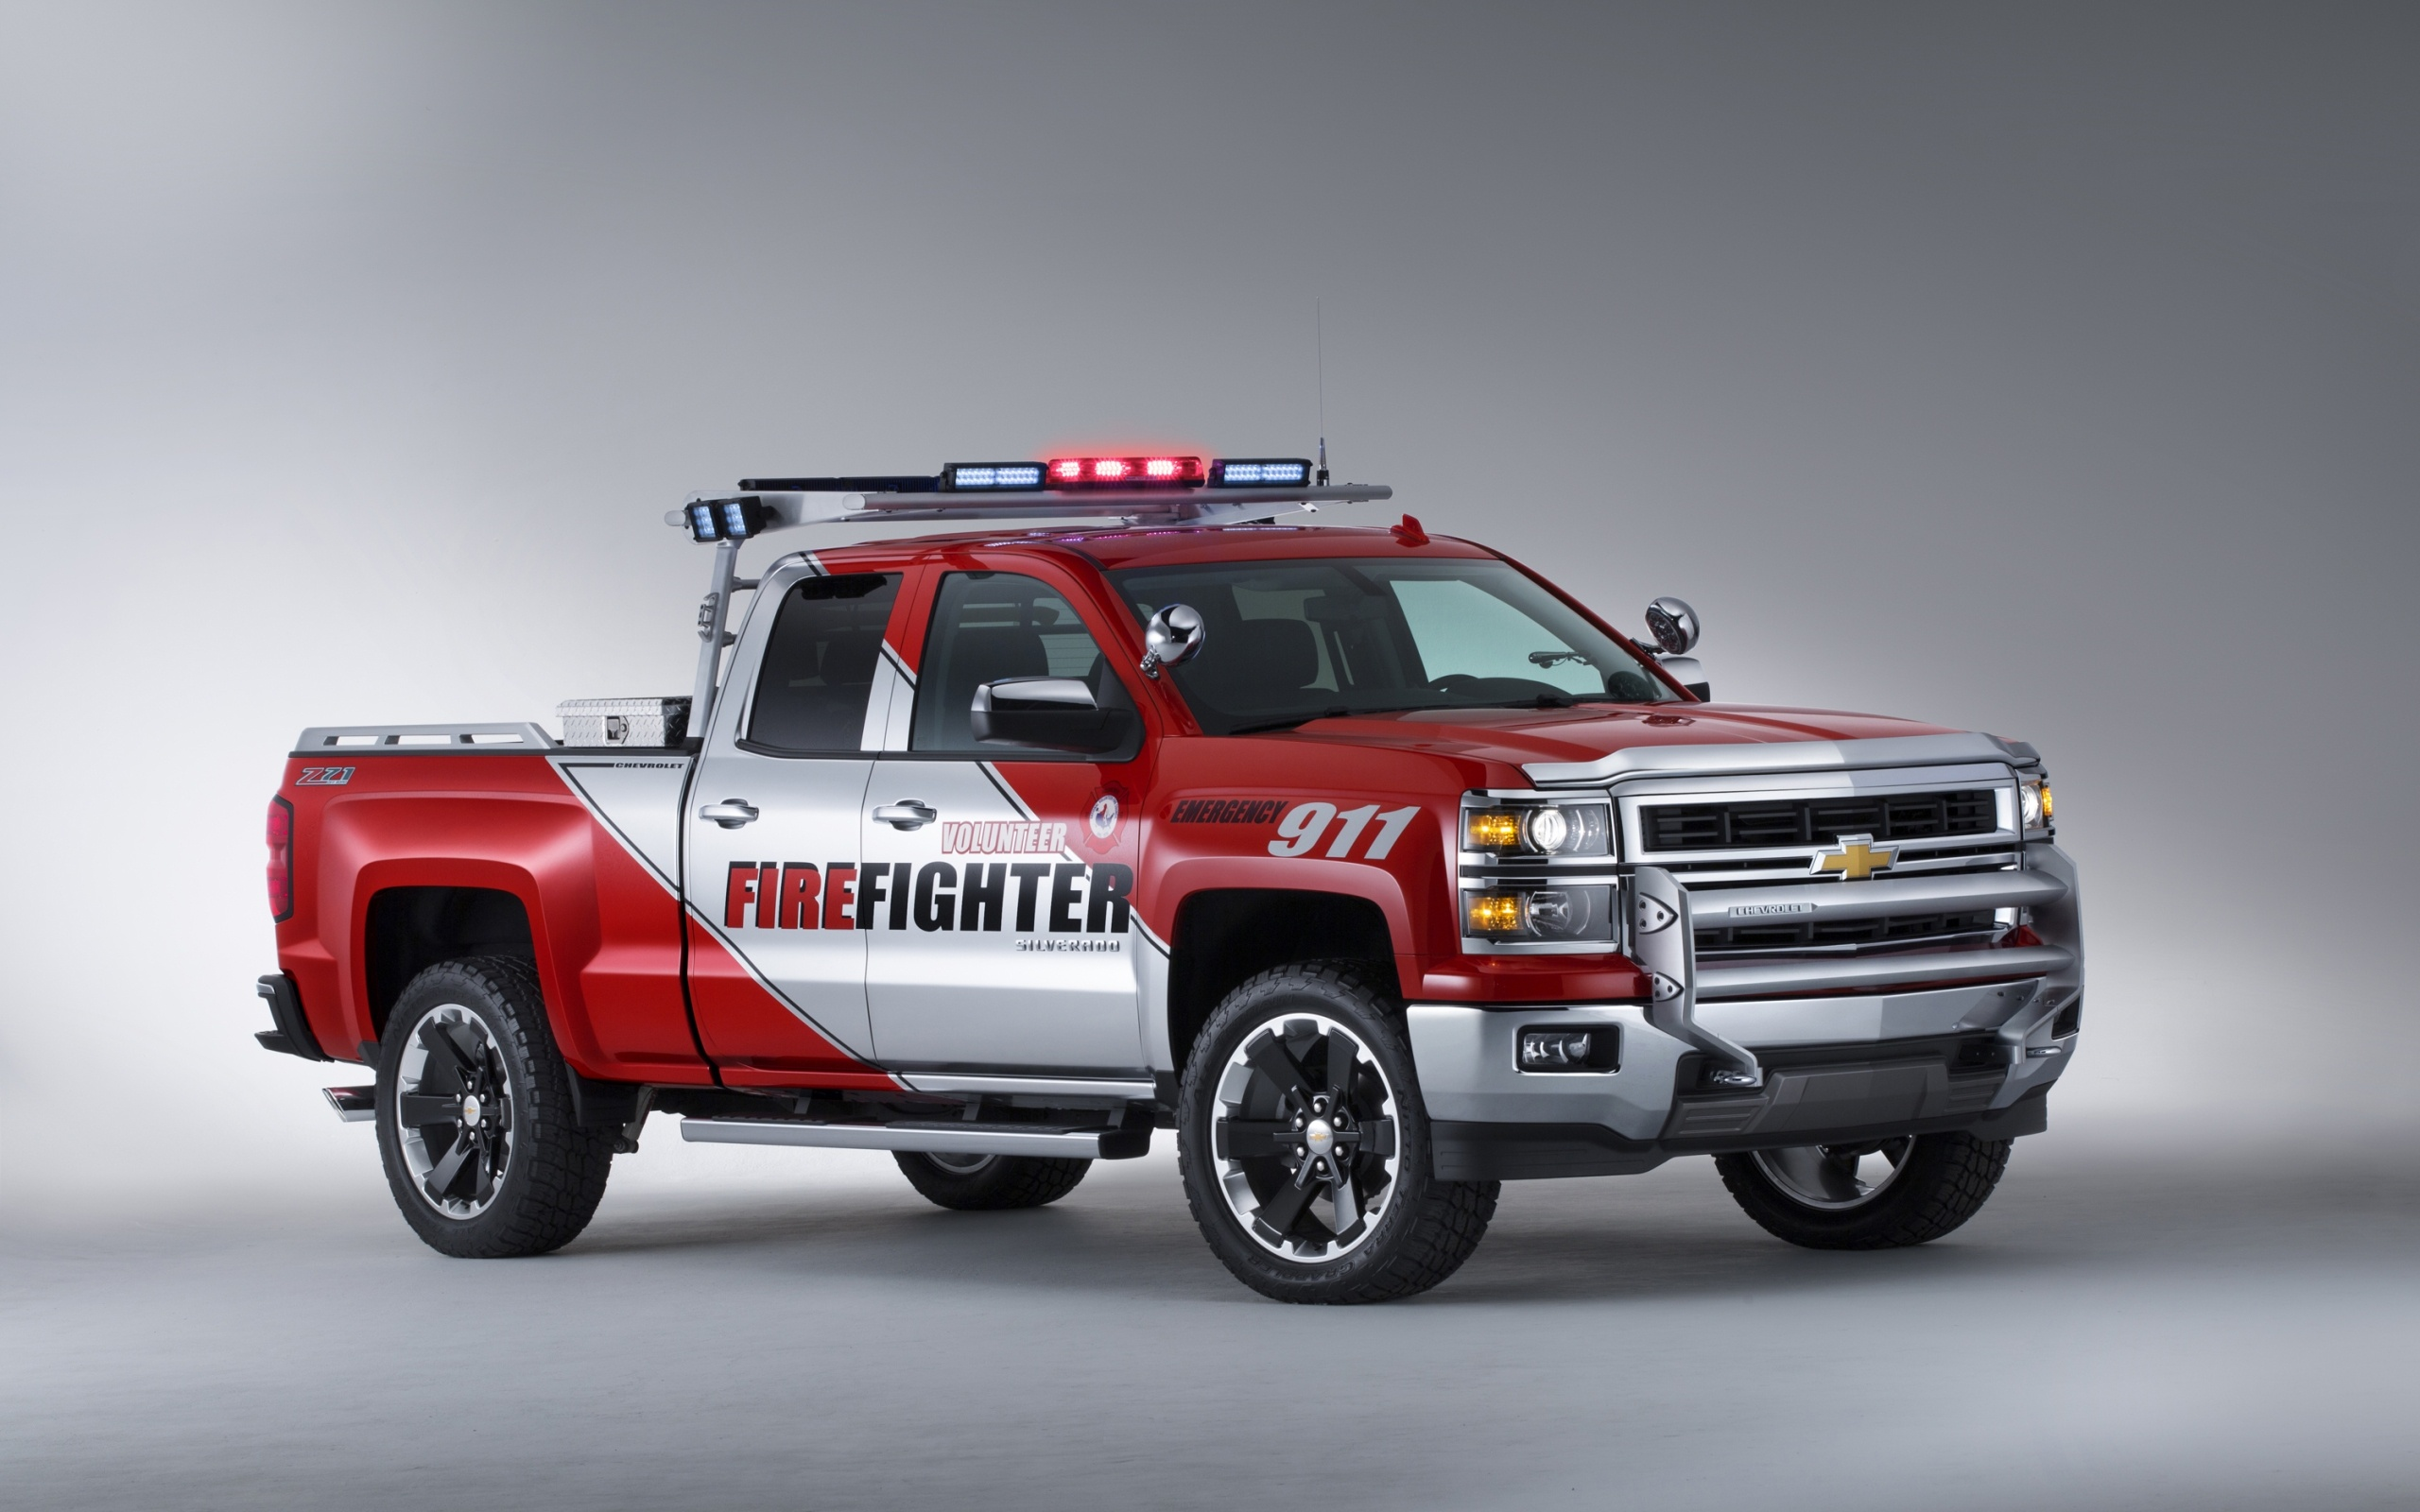 Chevrolet Silverado Reaper >> Chevrolet Silverado Firefighter 2013 Wallpapers - 2560x1600 - 715829